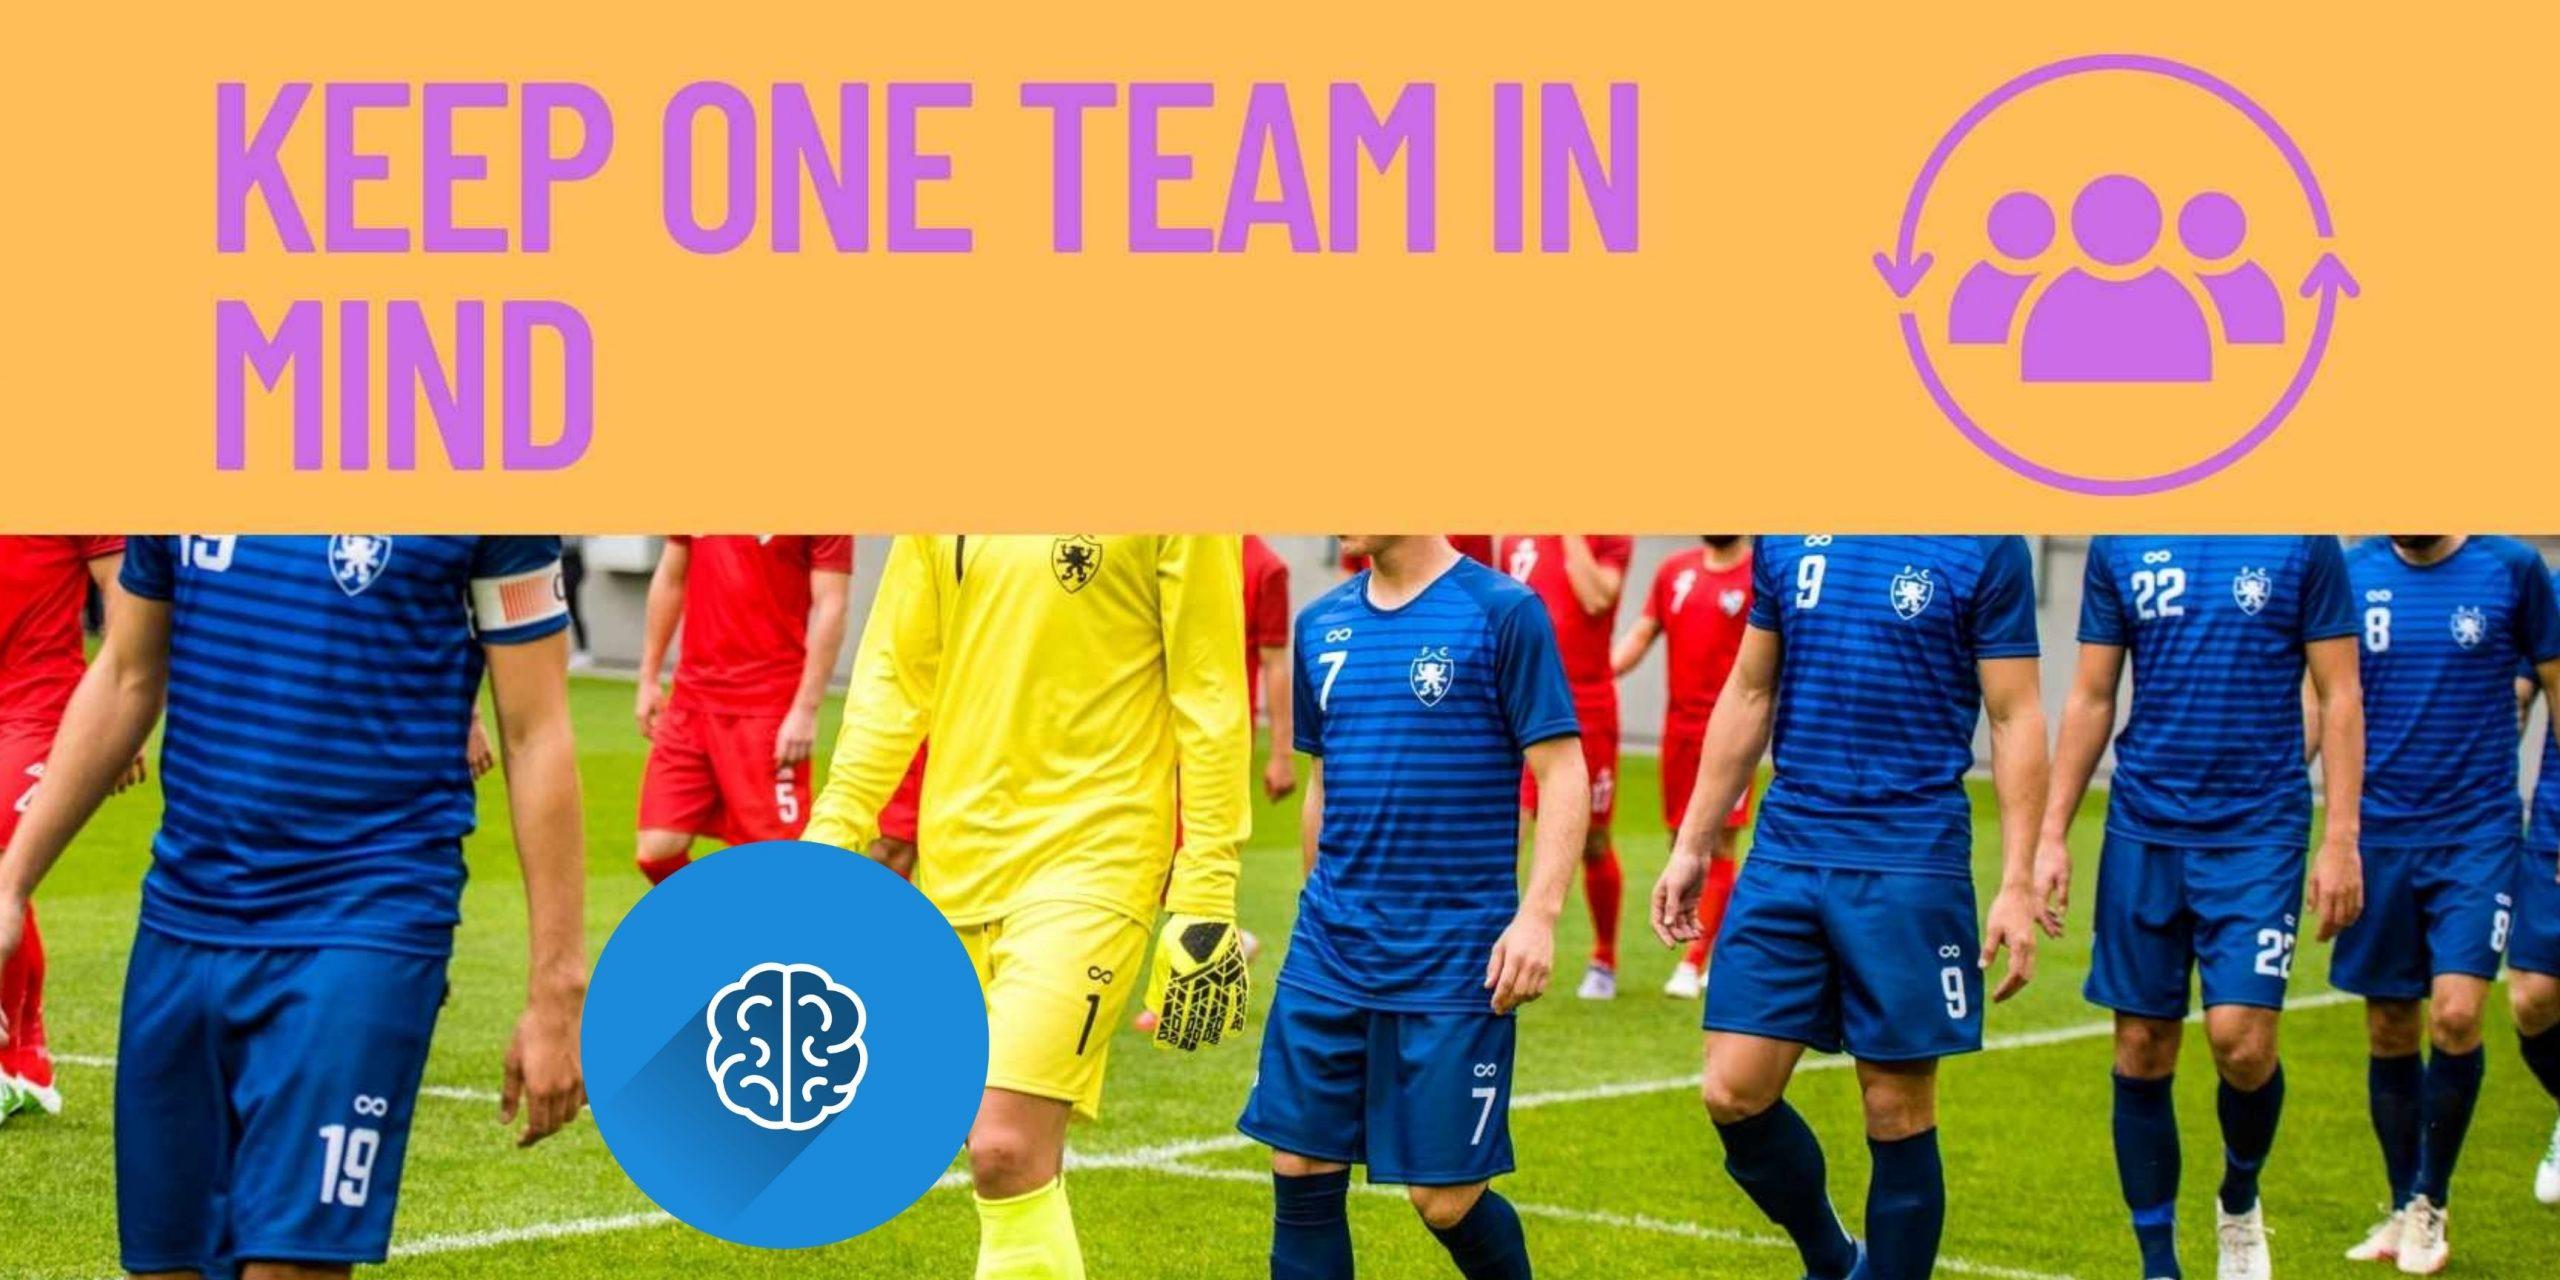 keep one team in mind